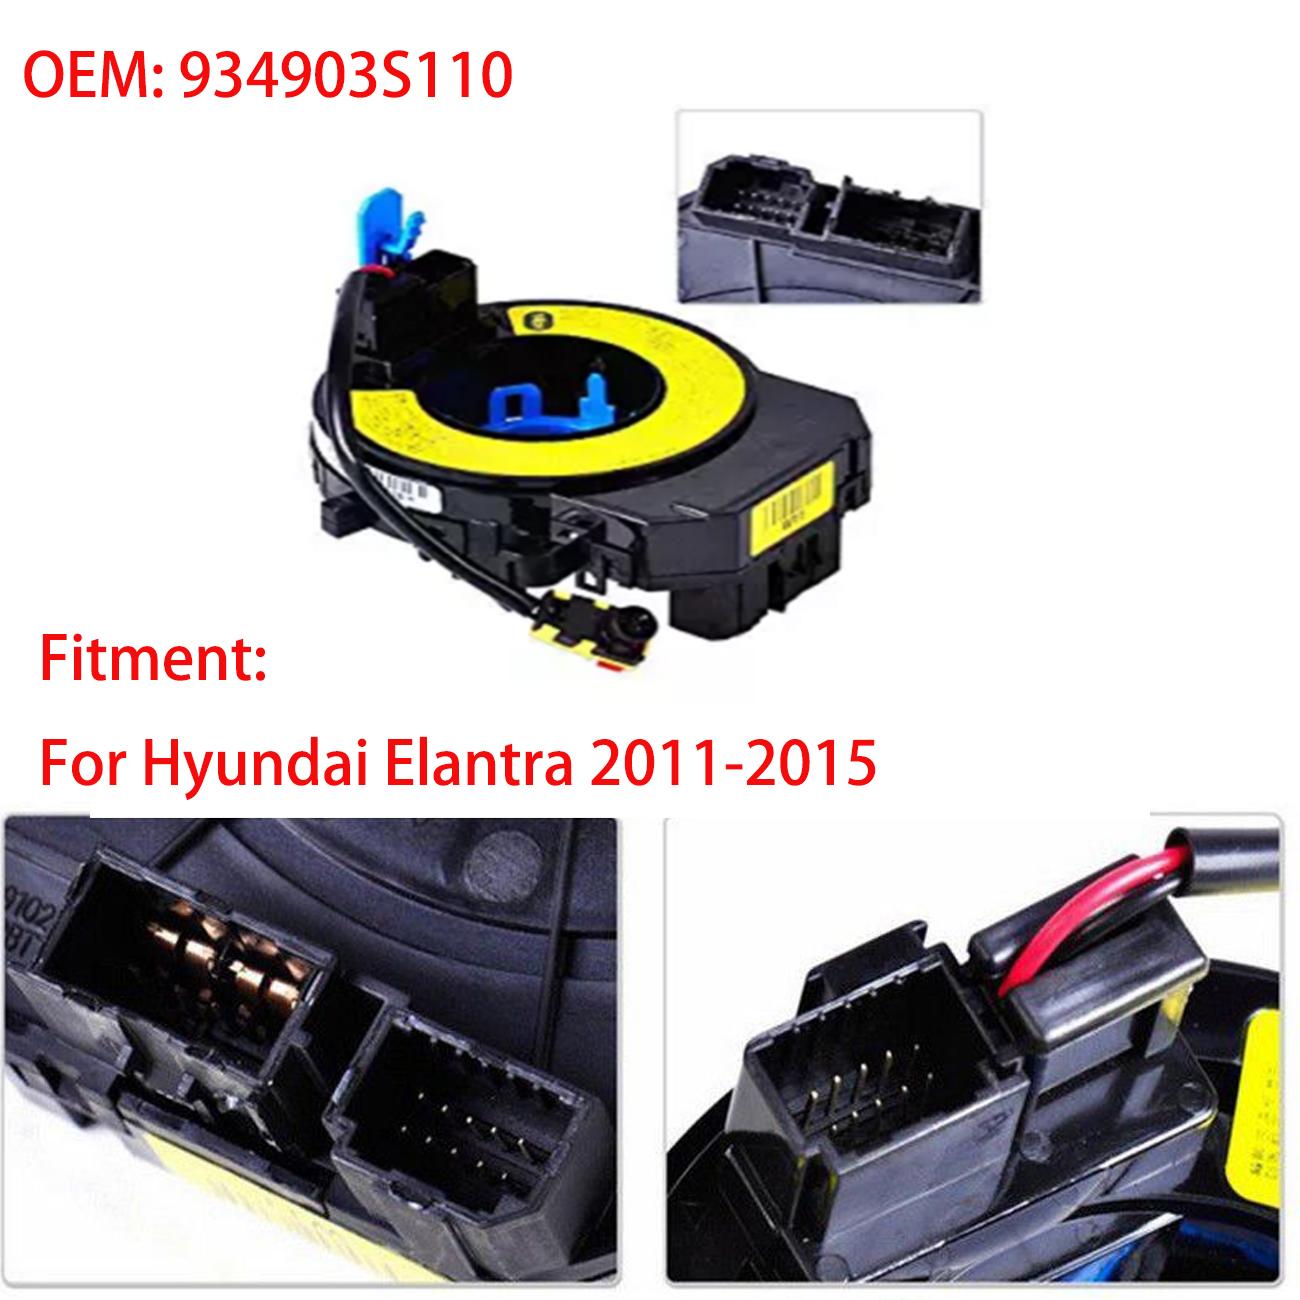 For Hyundai Elantra 2011-2015 New Spiral Cable Clock Spring Airbag 934903S110